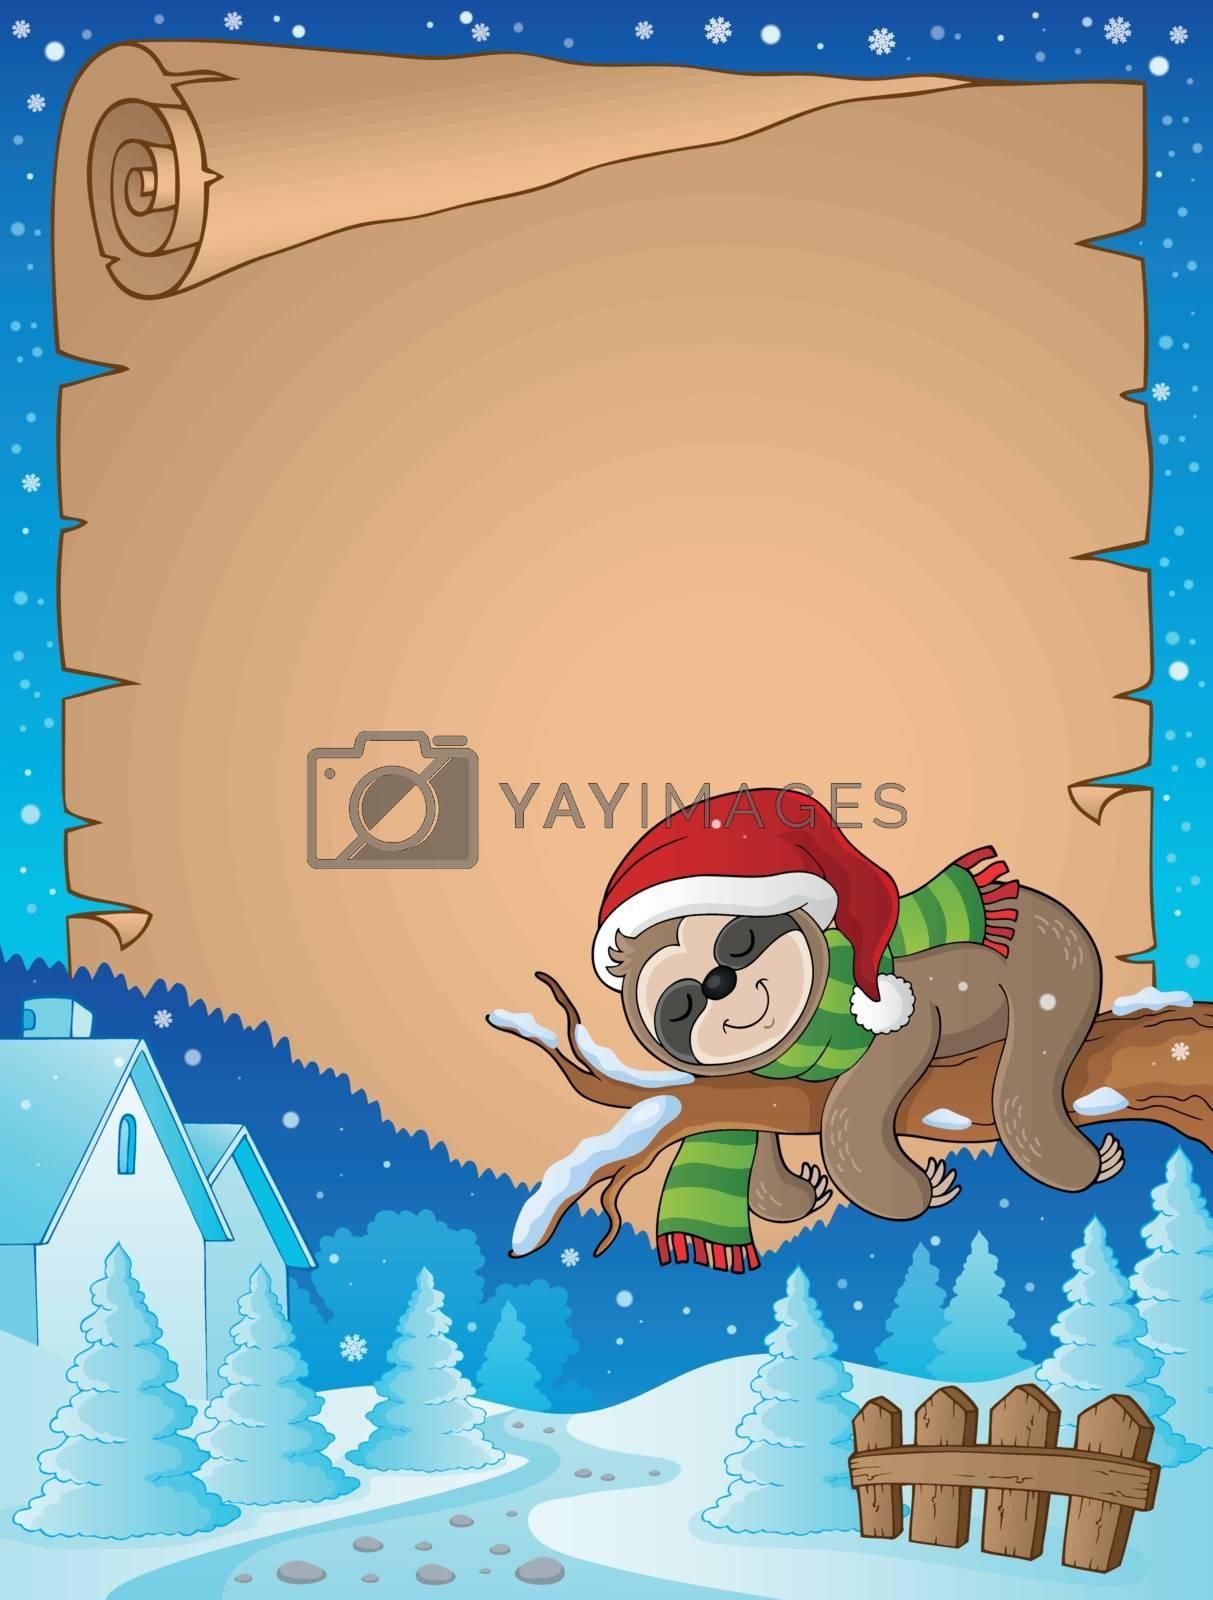 Christmas sloth theme parchment 2 - eps10 vector illustration.